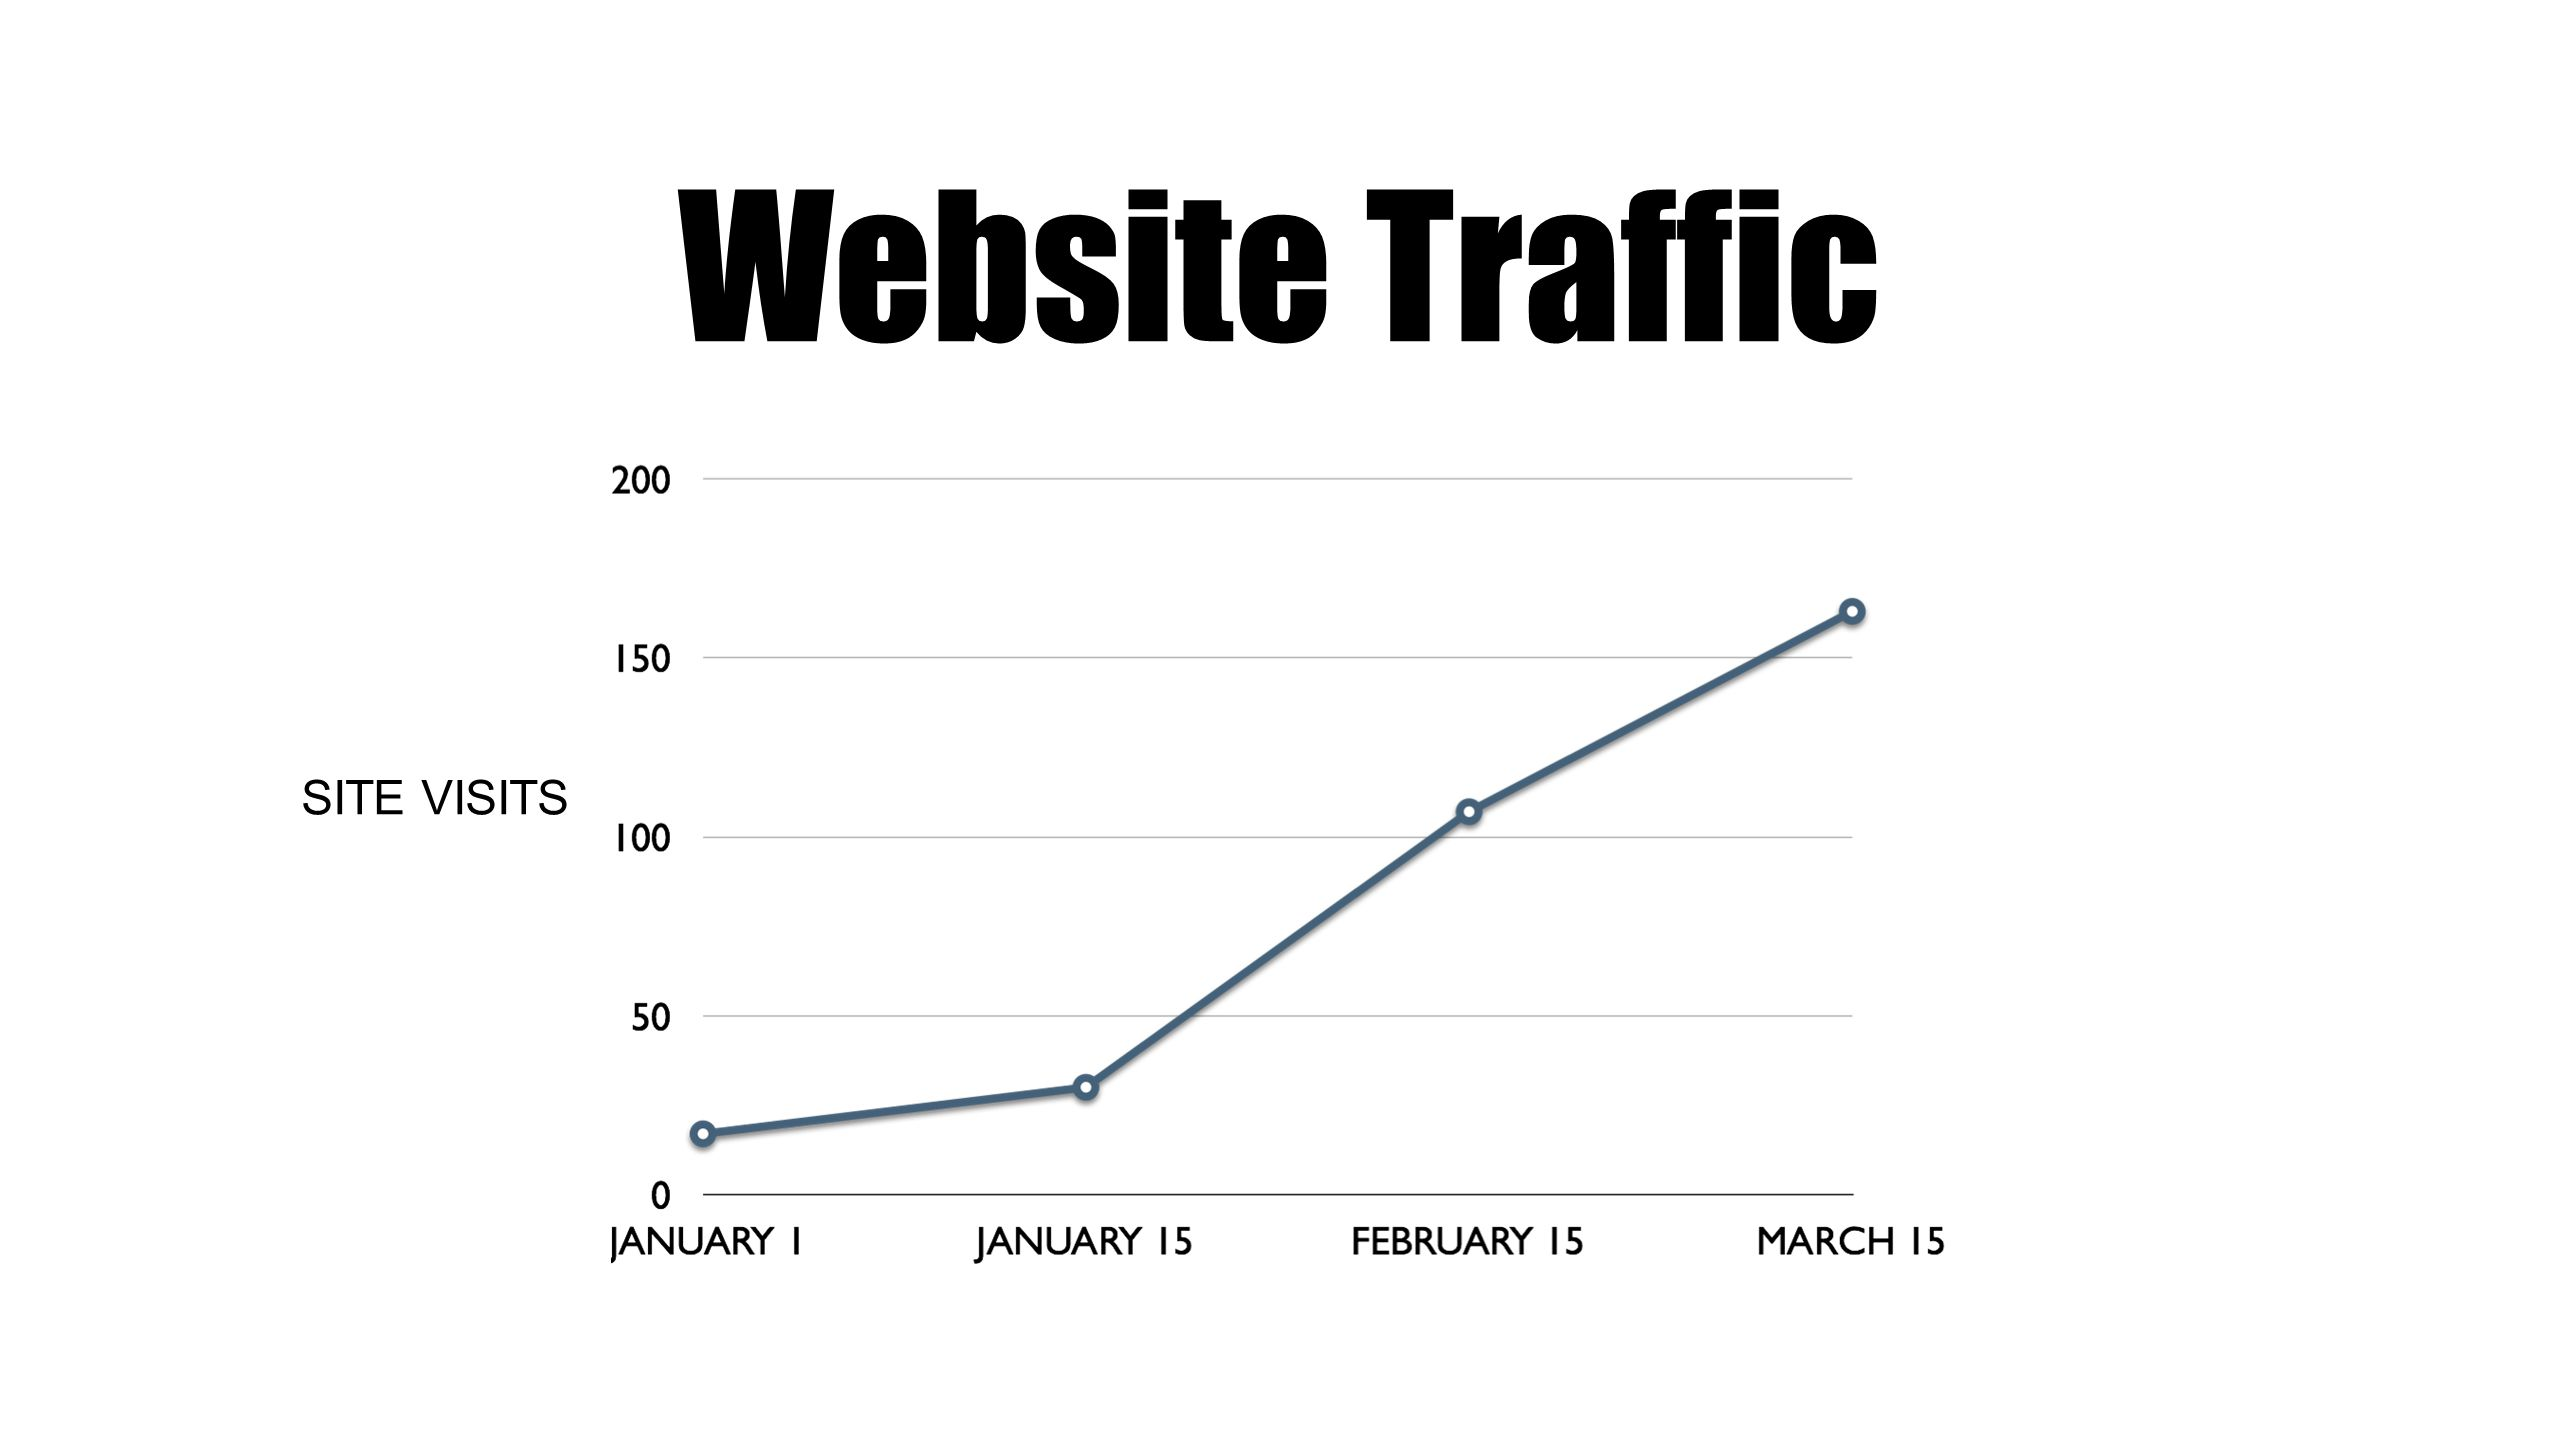 Website Traffic 5.0% 5.7% 8.1% 6.2% SITE VISITS